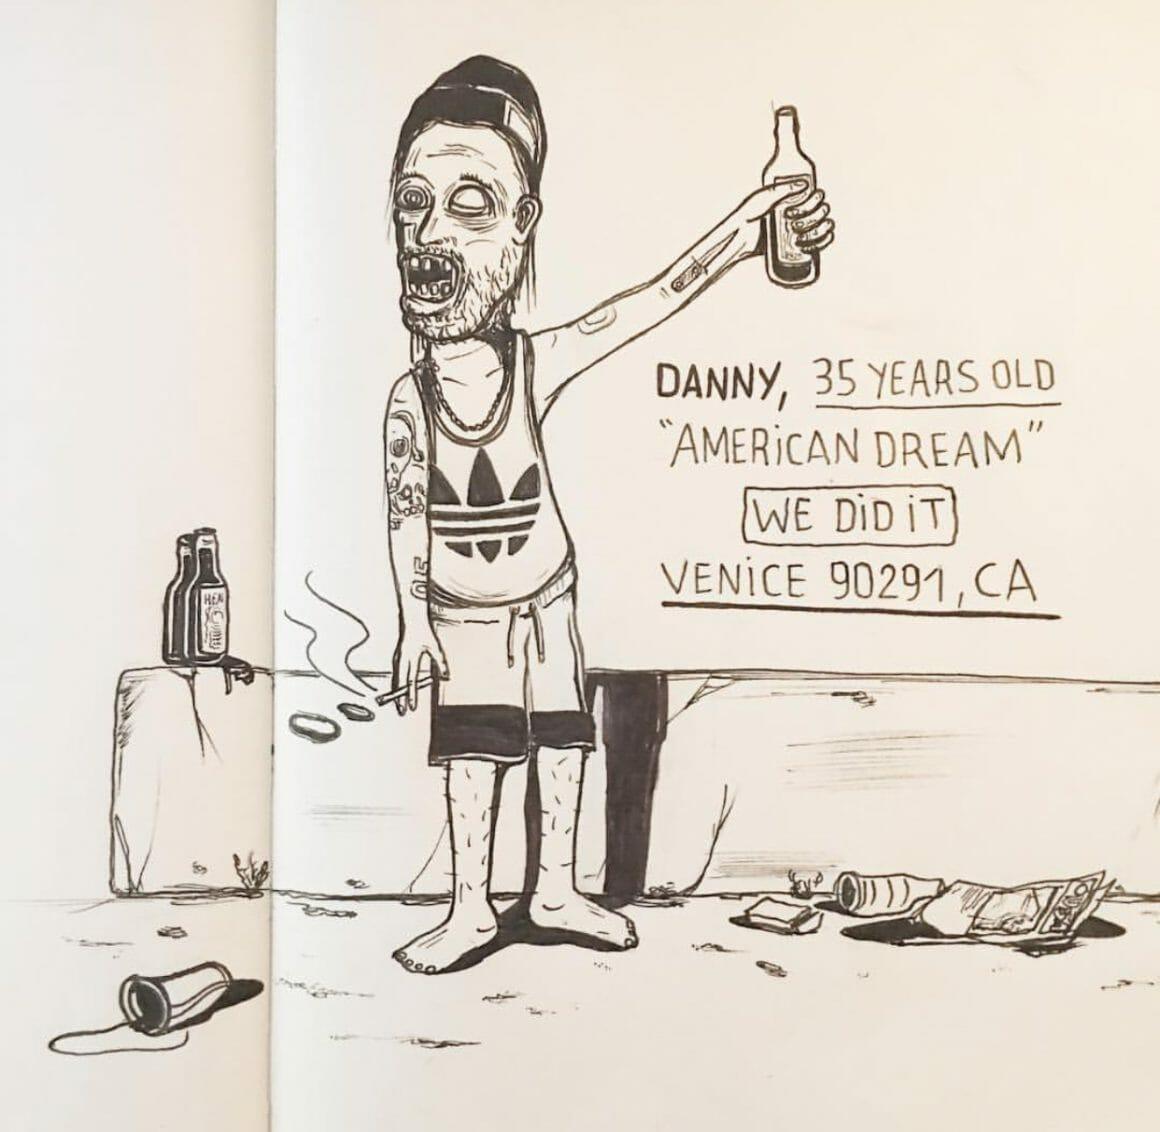 Mygalo : Danny